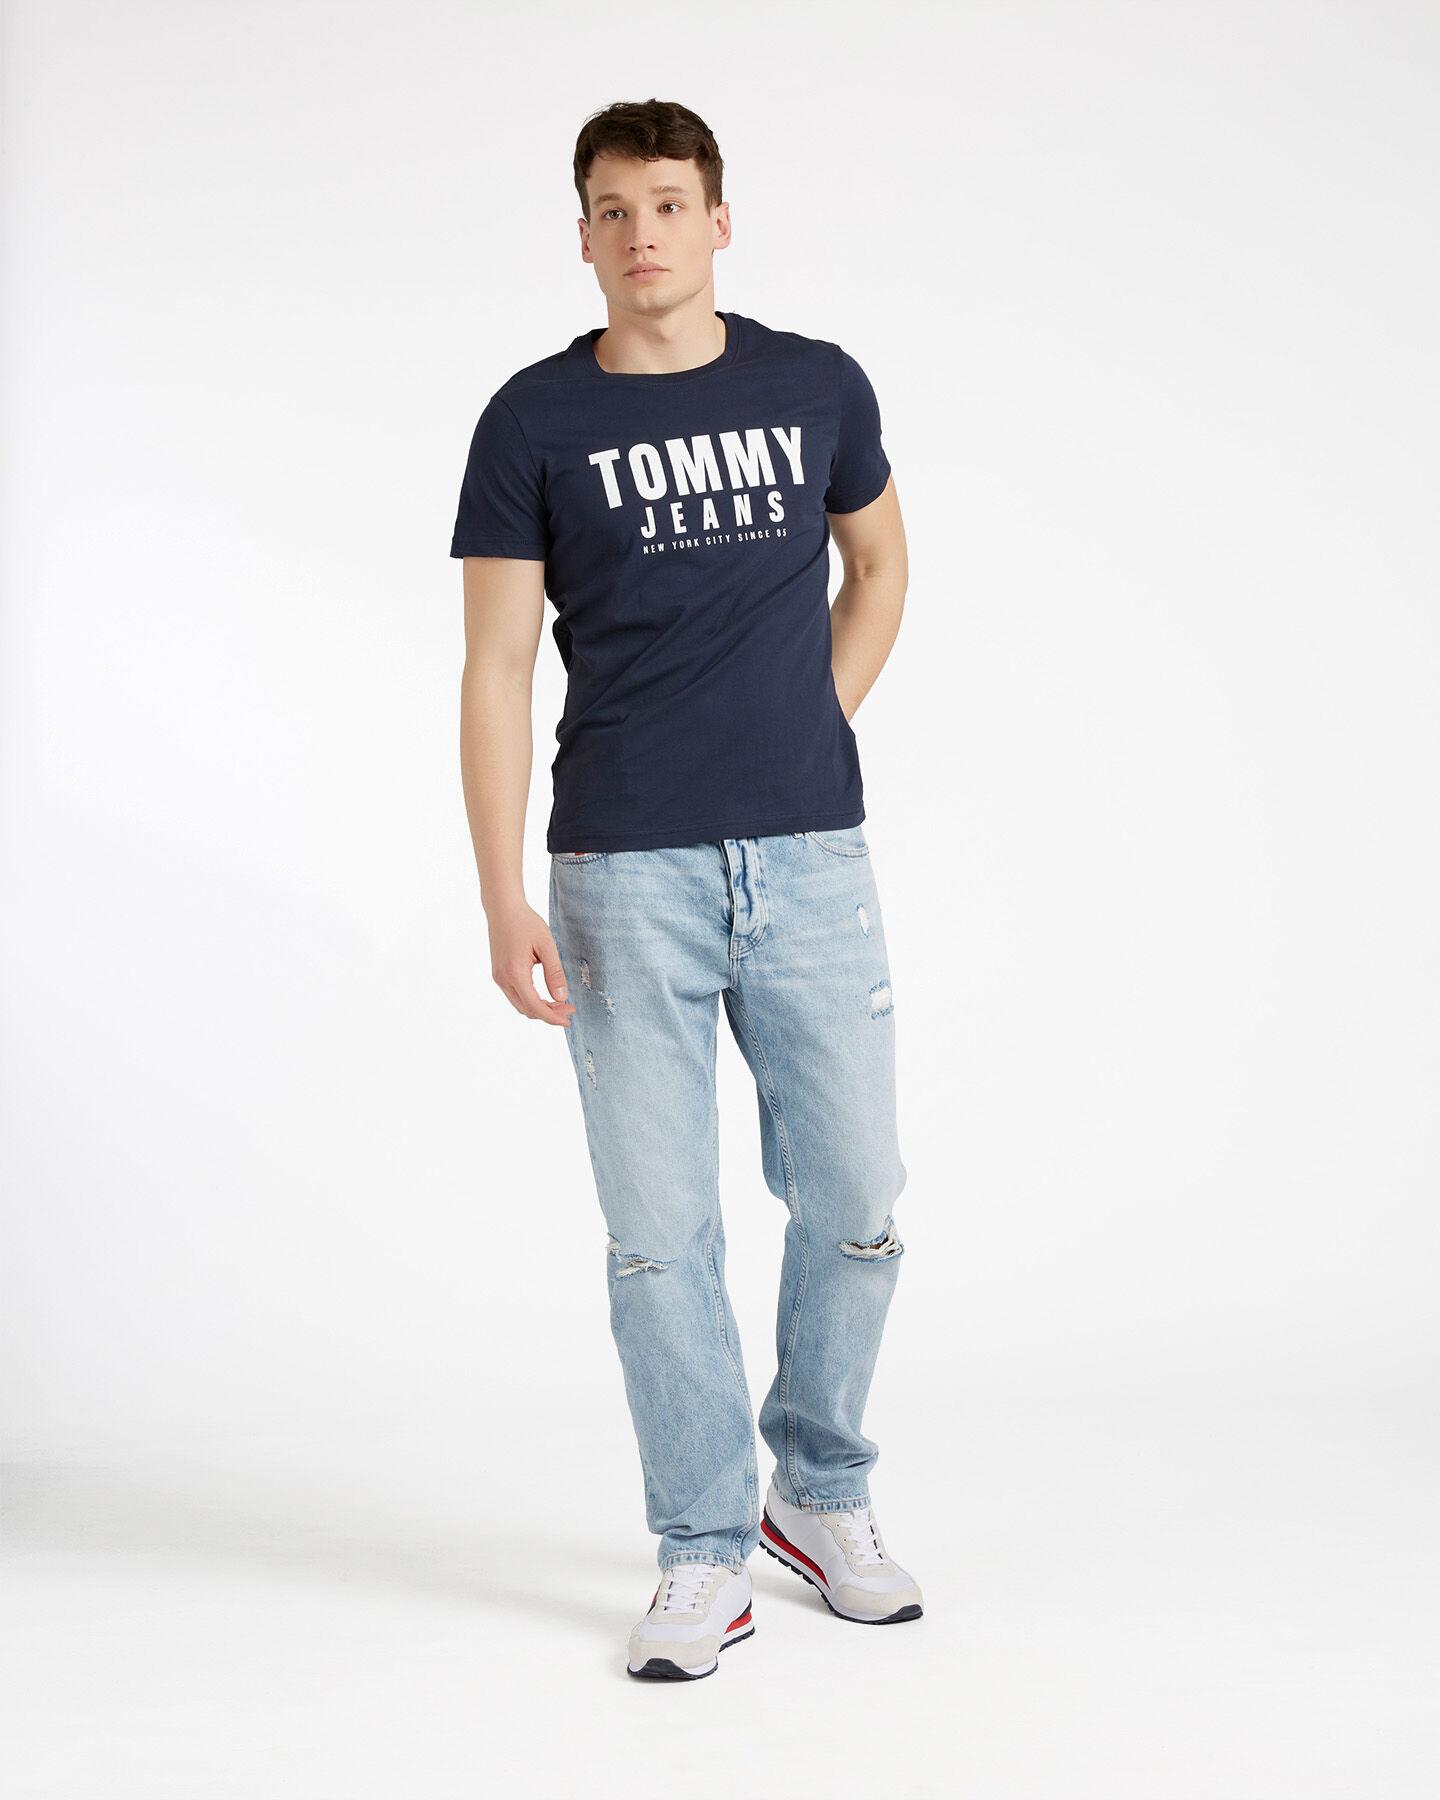 T-Shirt TOMMY HILFIGER CHEST BIG LOGO M S4088729 scatto 1